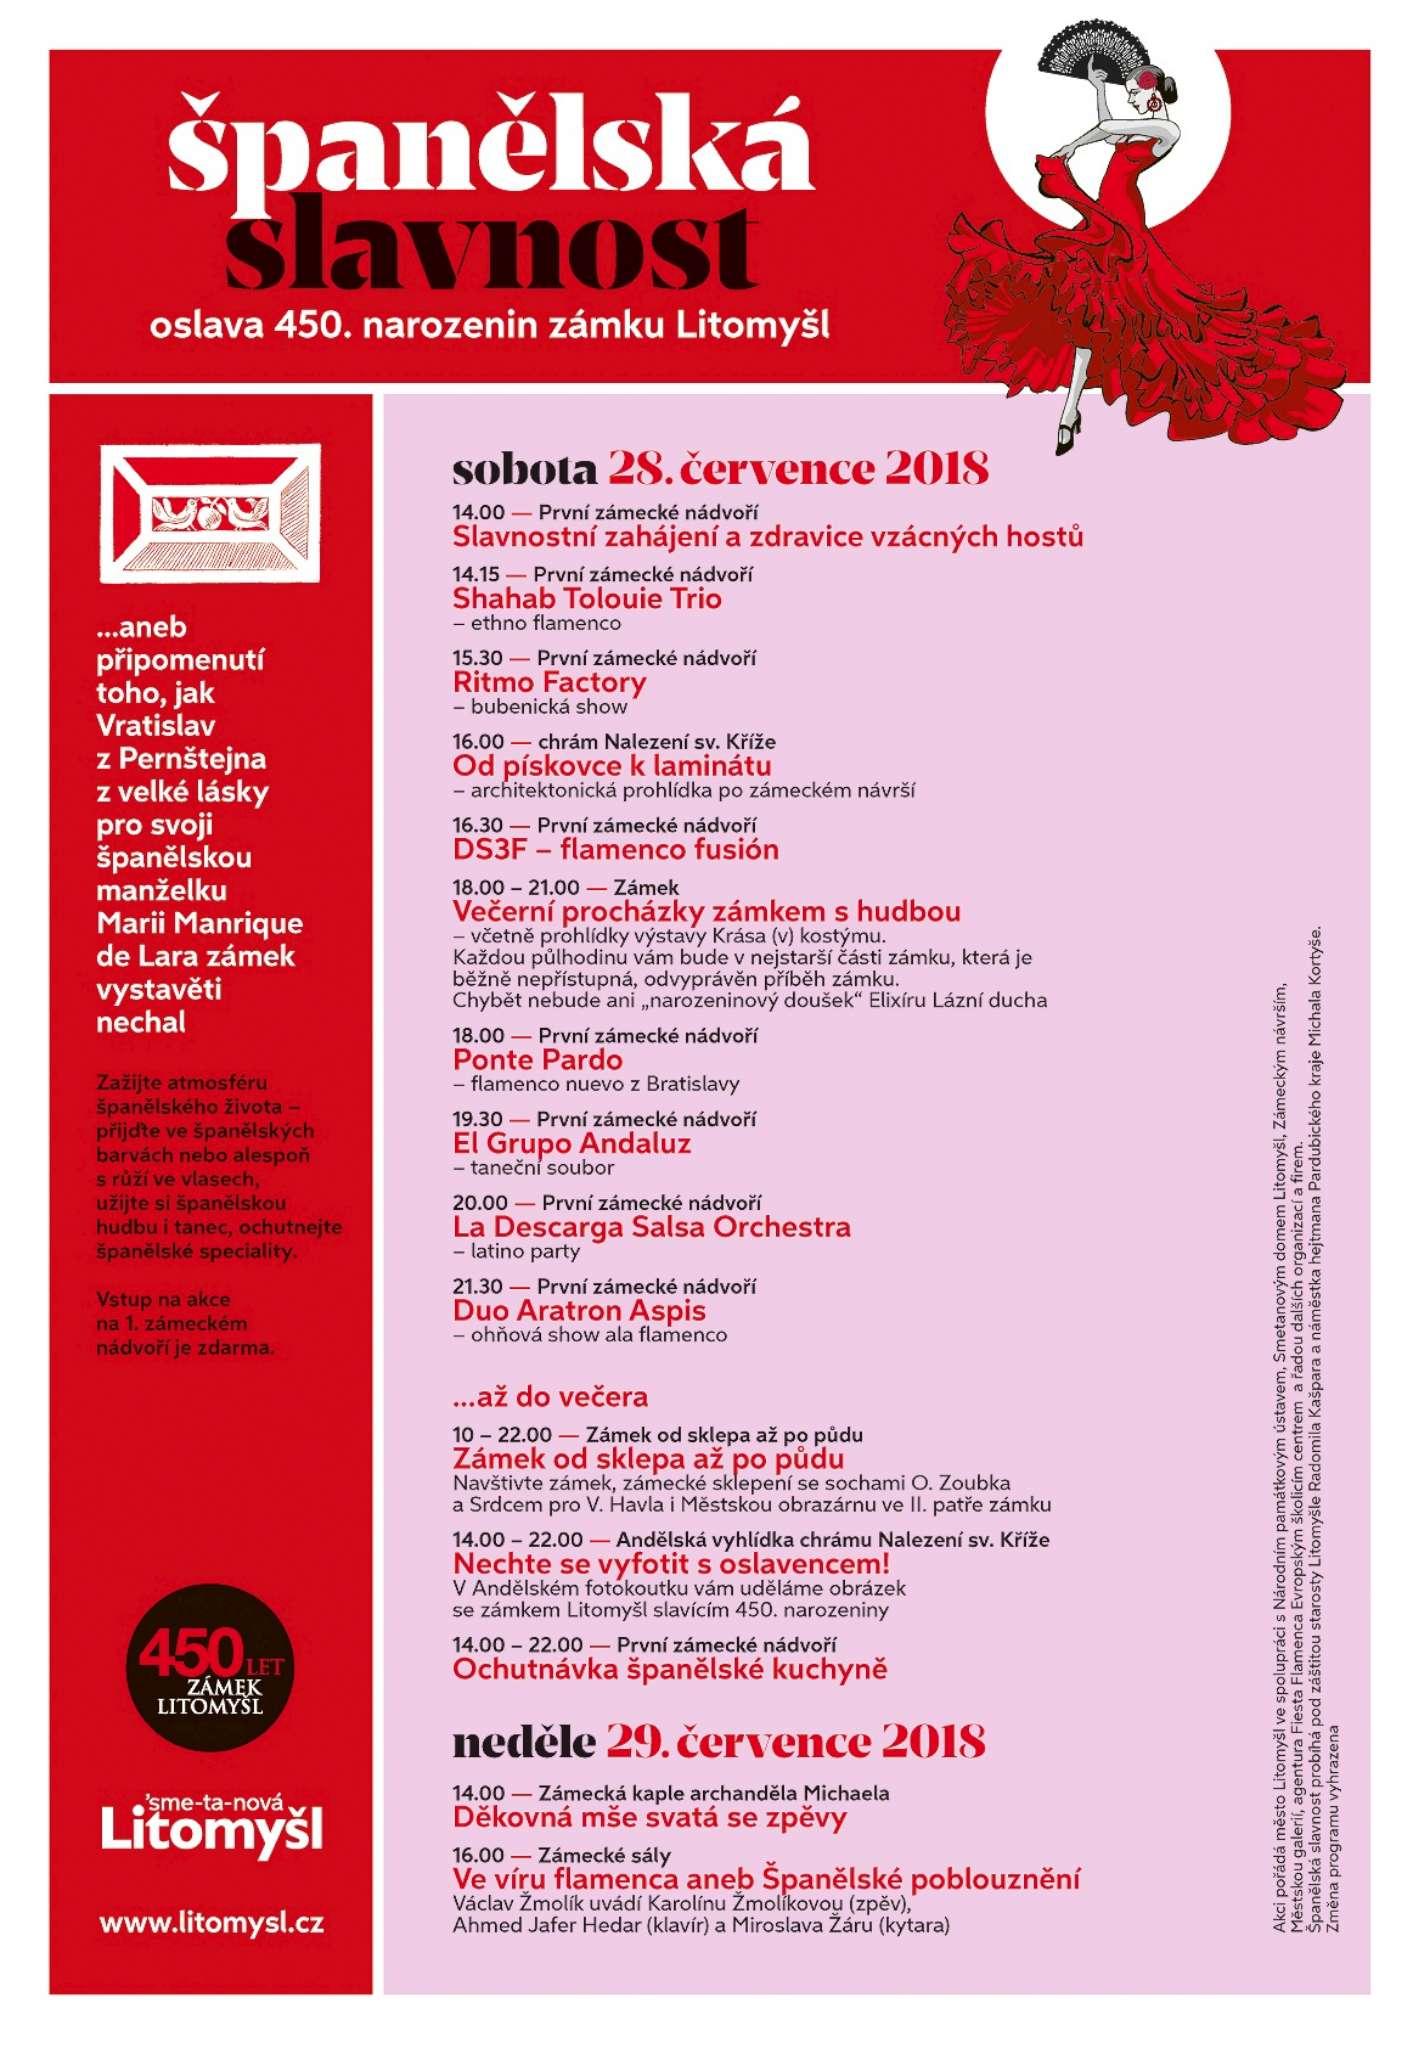 spanelska-slavnost-litomysl-2048